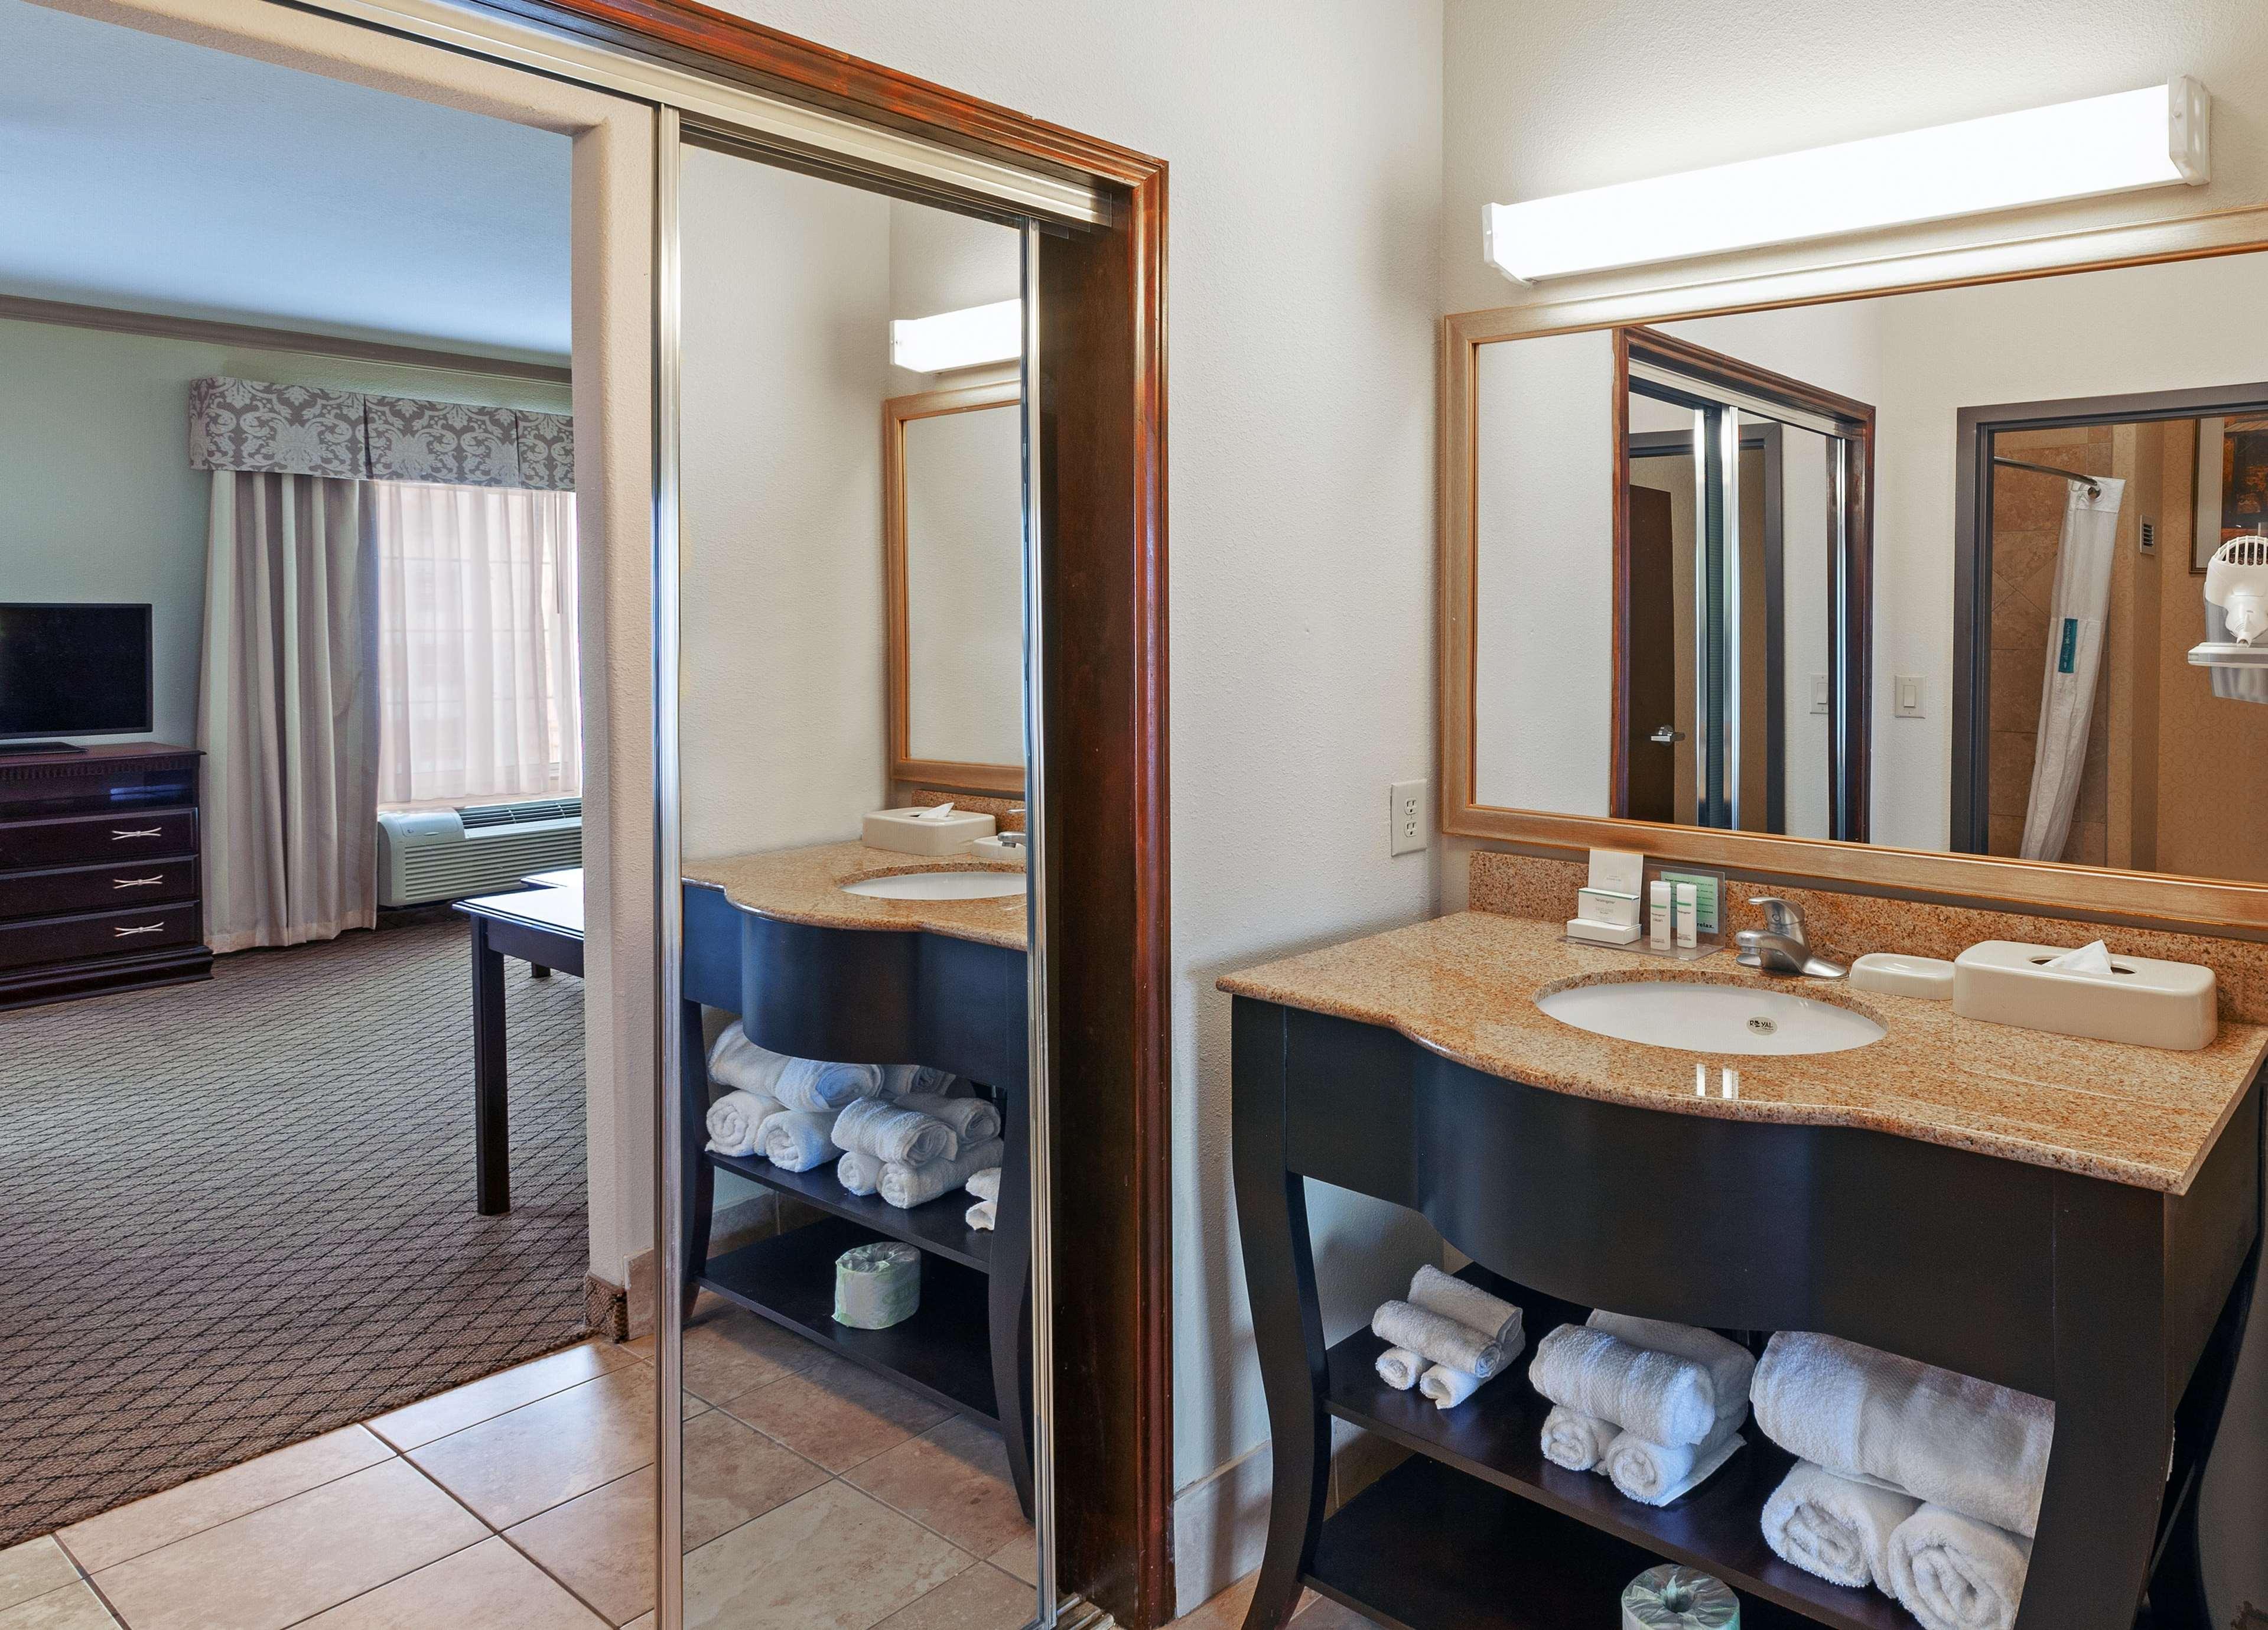 Hampton Inn & Suites Galveston image 28